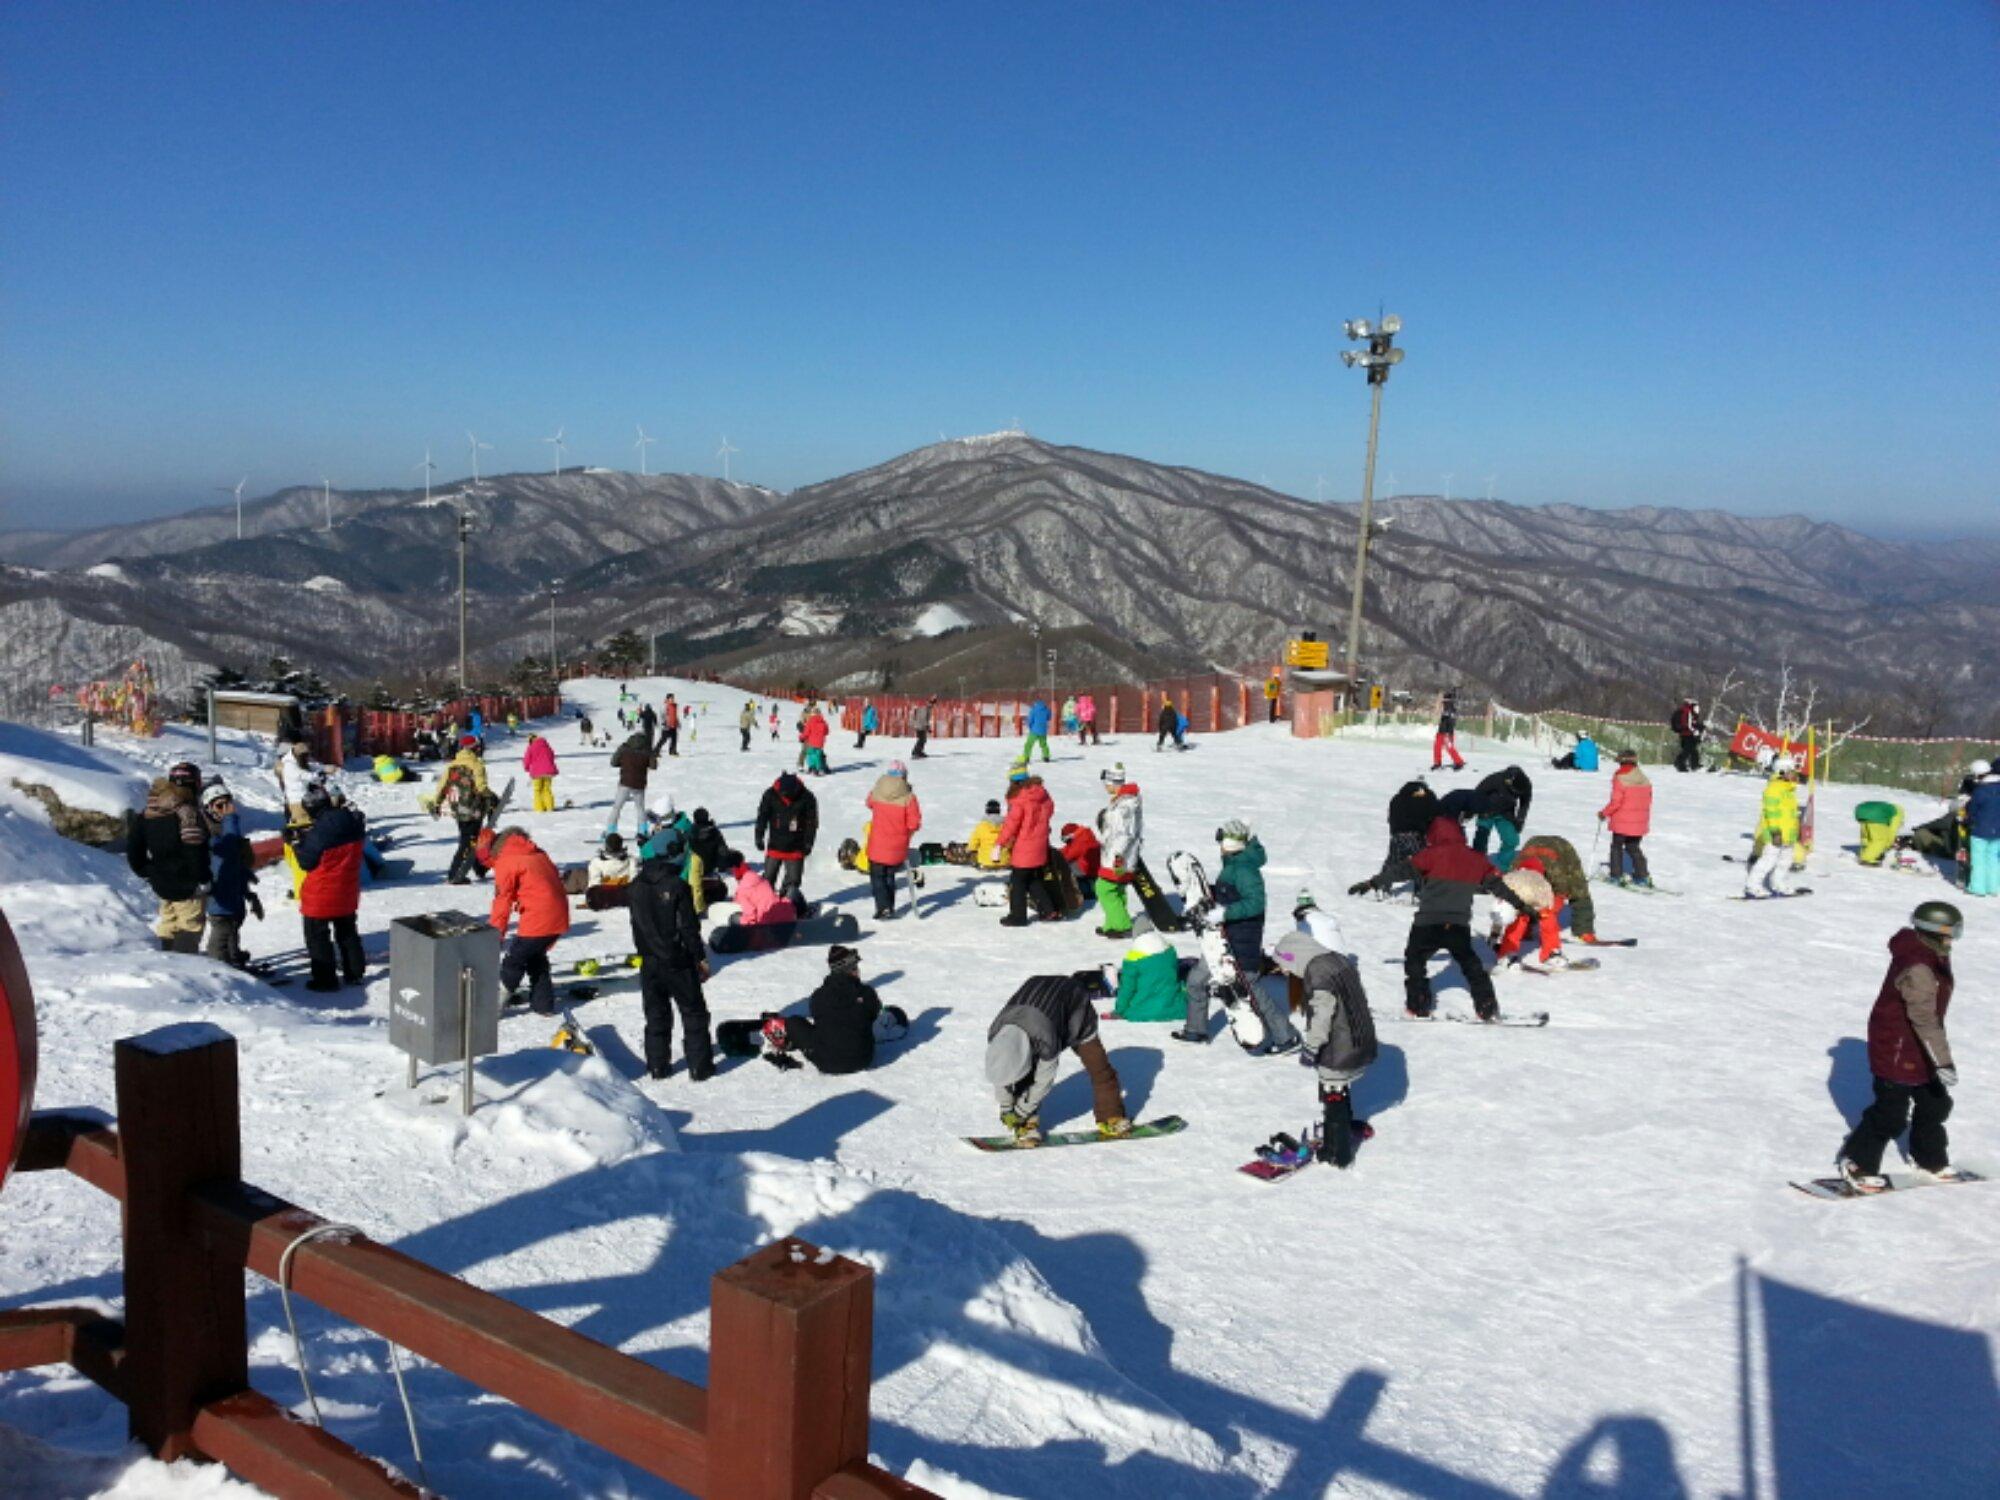 yongpyong resort - a winter wonderland - journo on the run